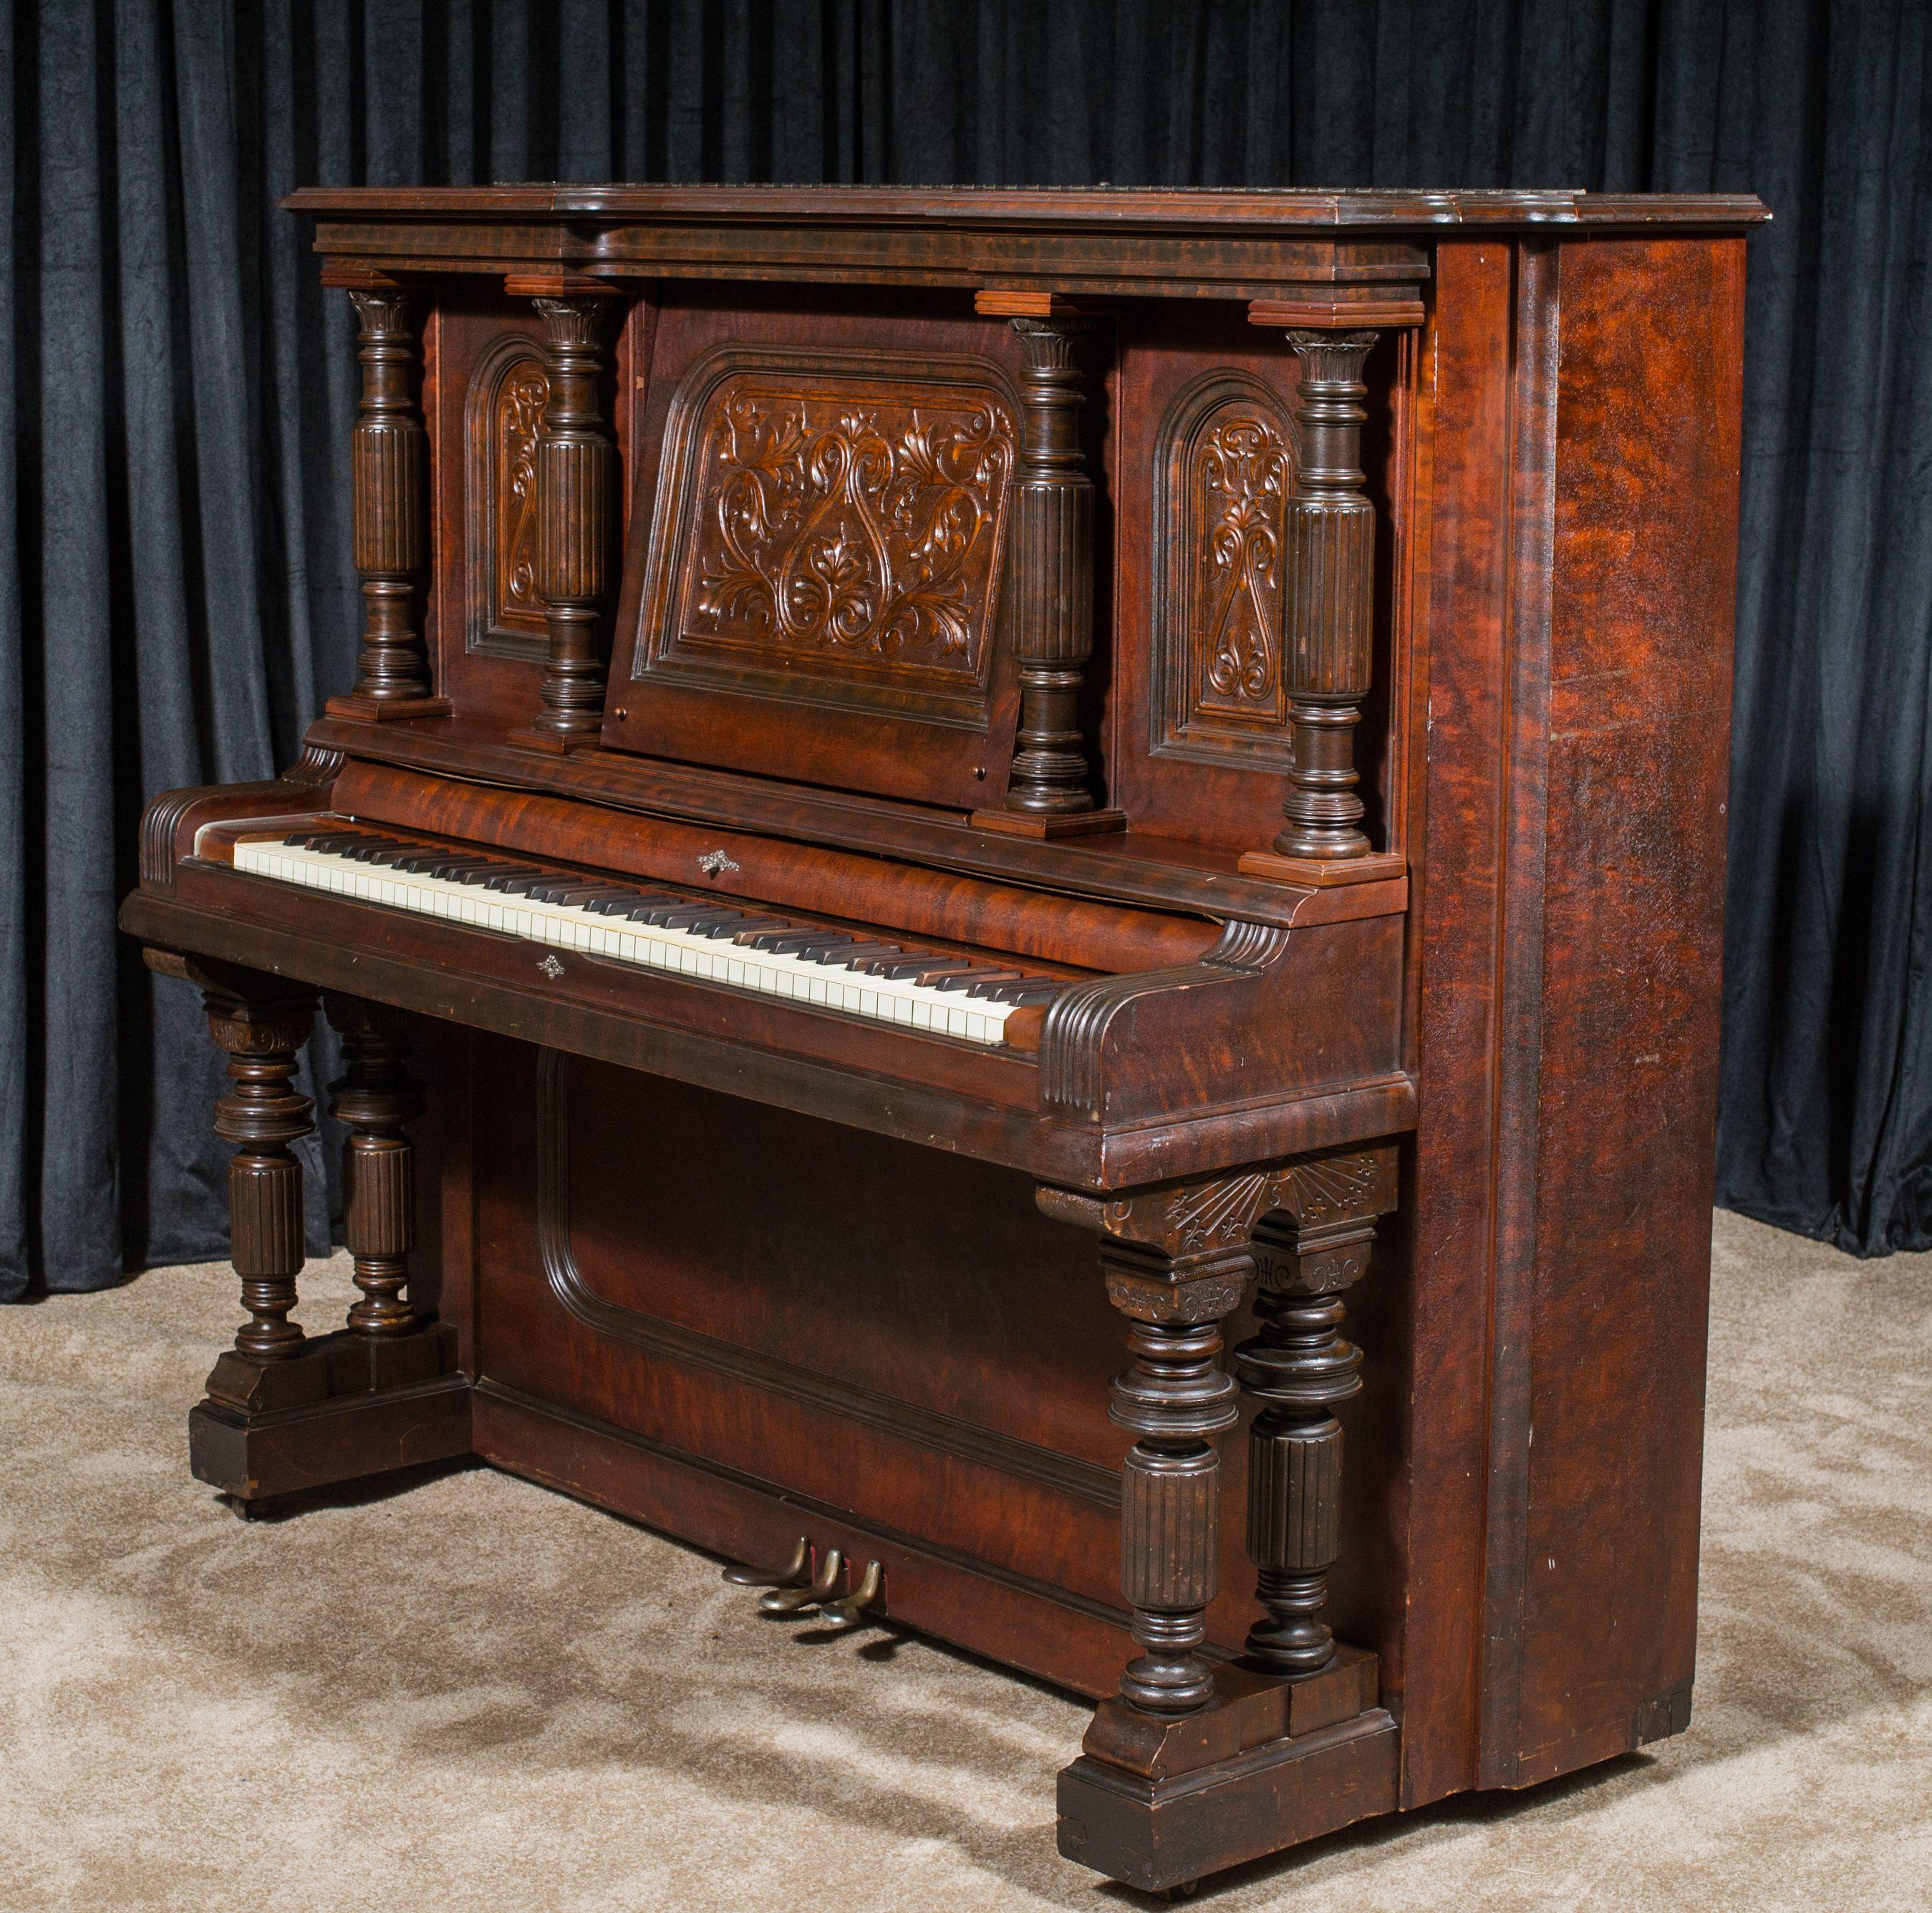 photo old piano - photo #46